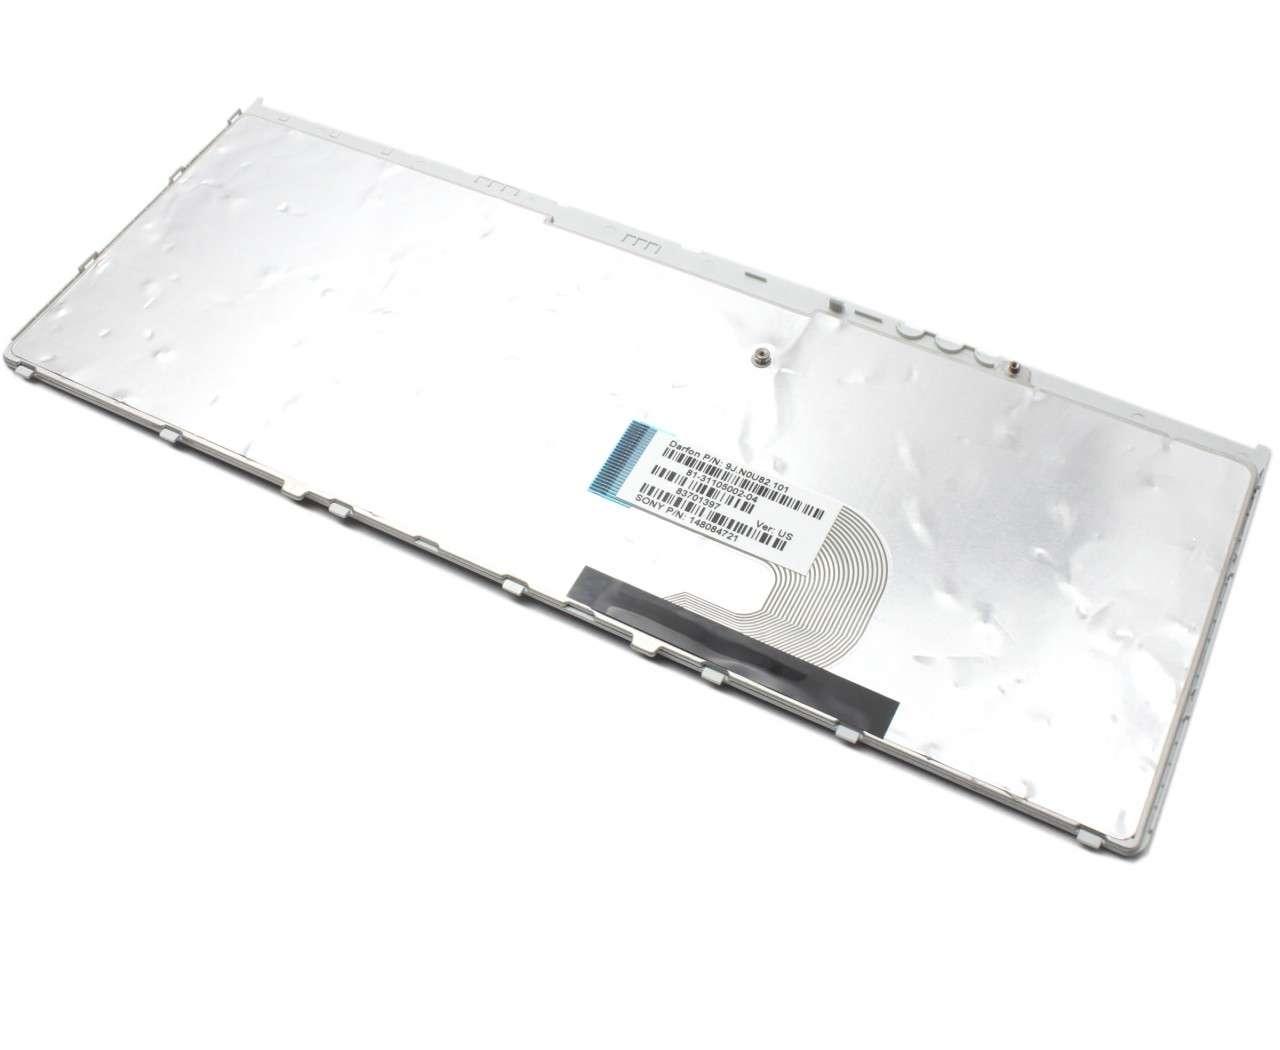 Tastatura Sony Vaio VGN-FW46GJB neagra cu rama gri imagine powerlaptop.ro 2021